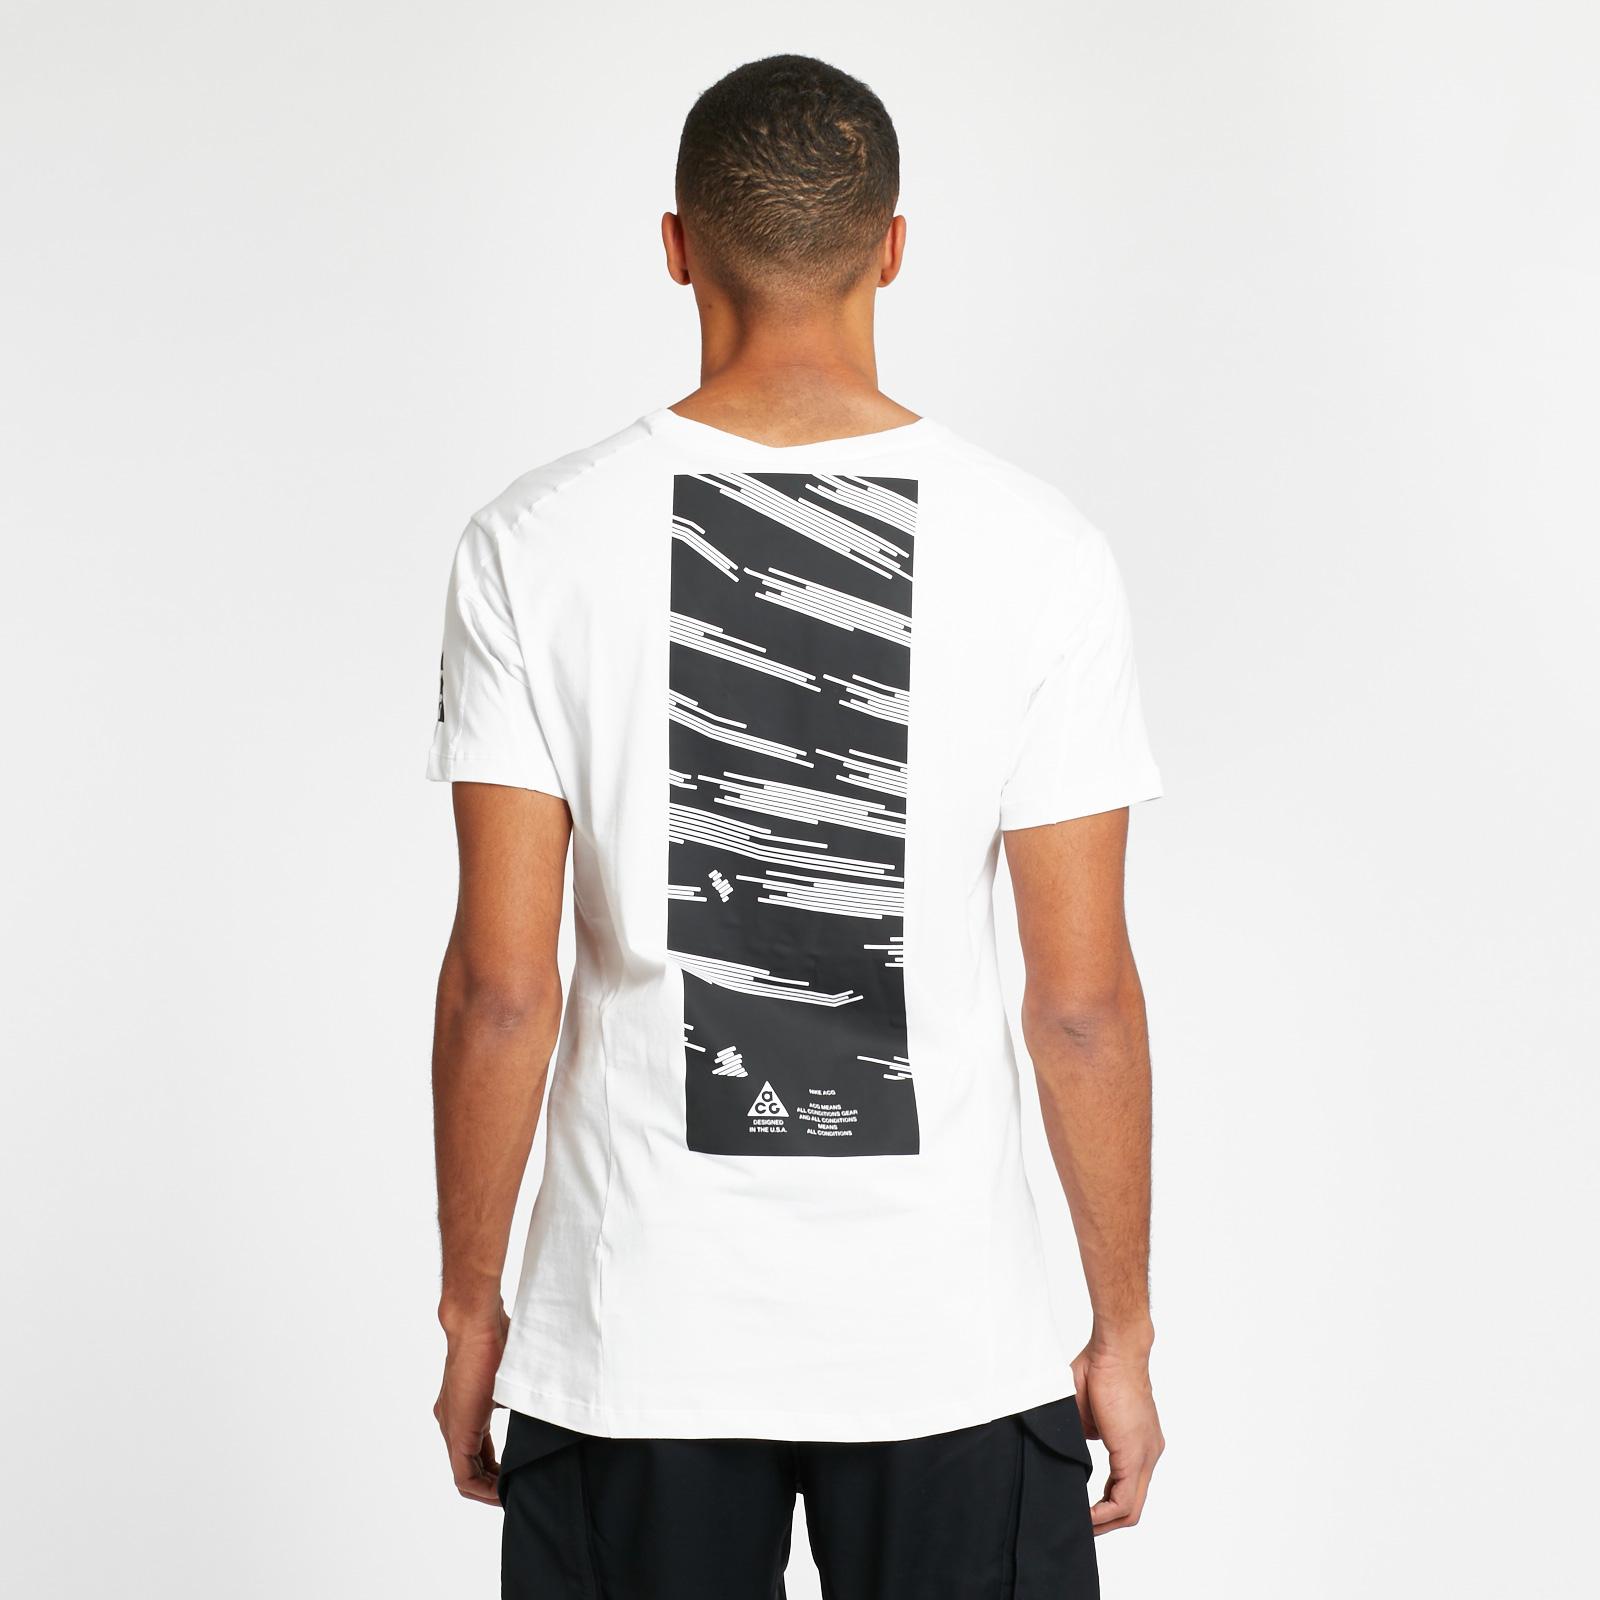 Tee Nike 918906 Shirt M Sneakersnstuff Acg Sneakers 100 qqUrBEW